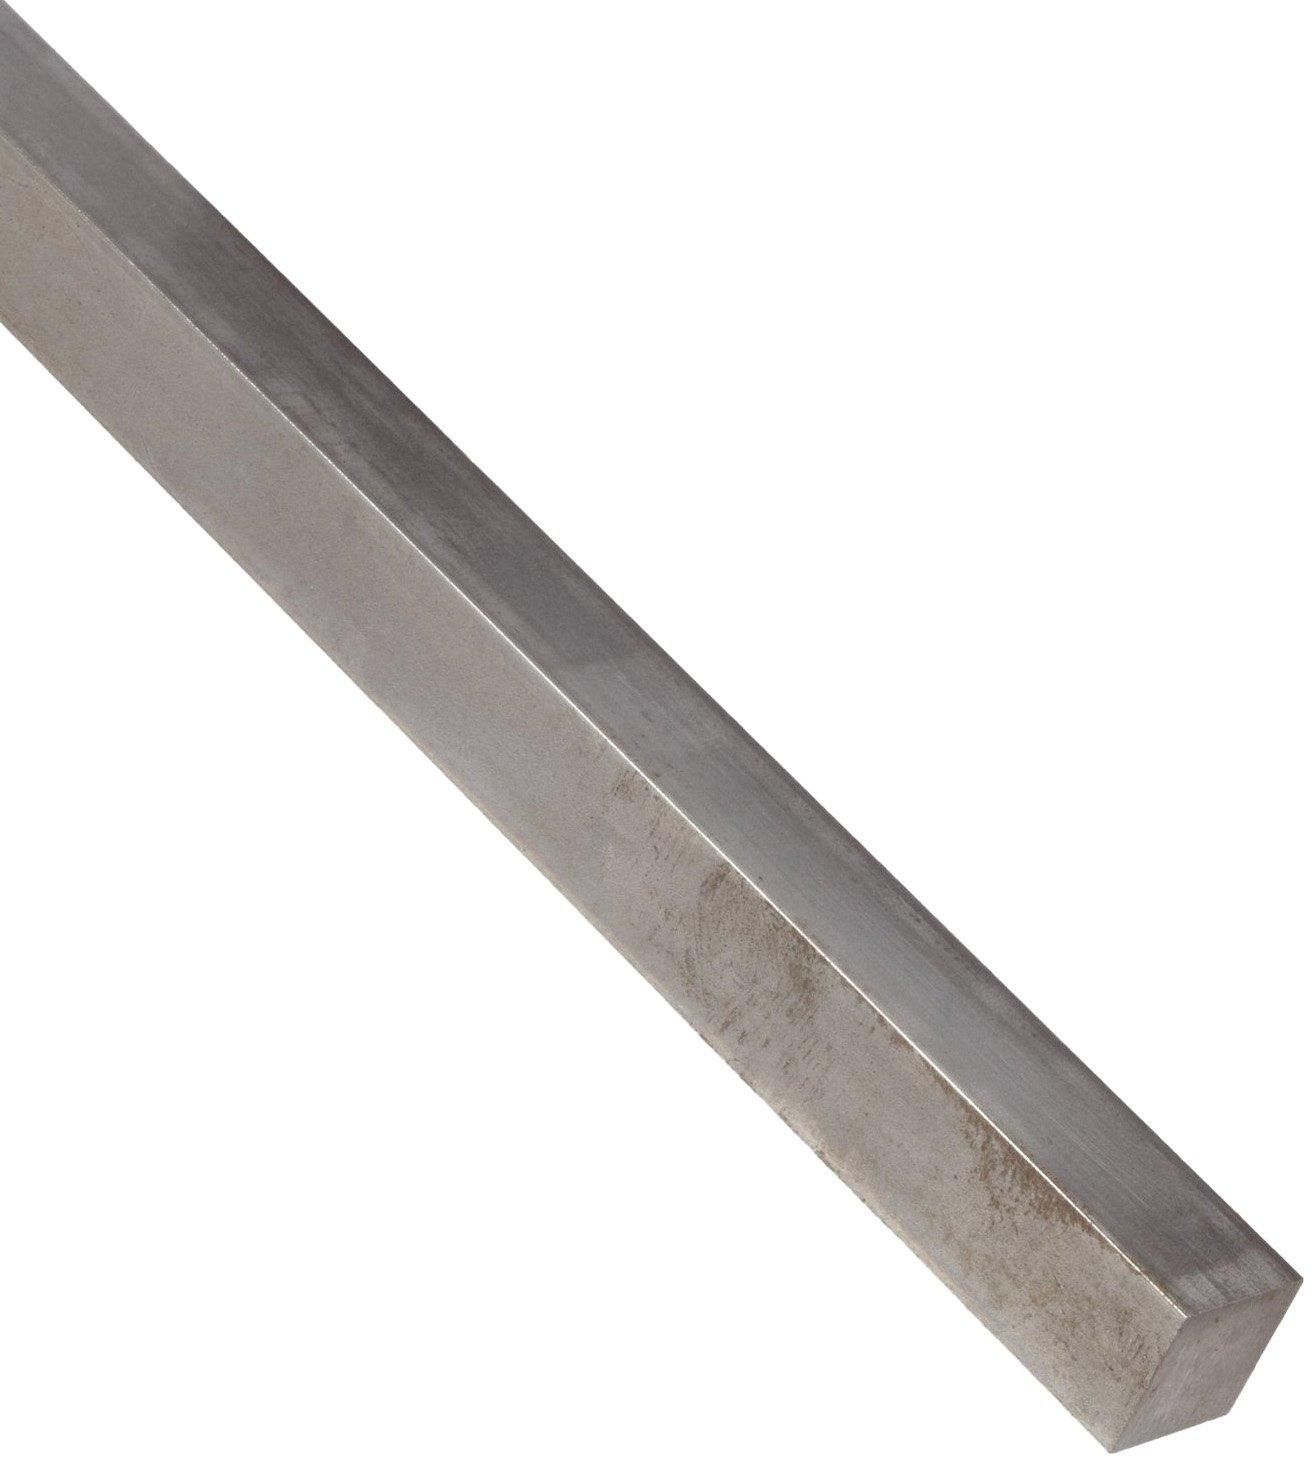 Amazon com: 12L14 Steel Rectangular Bar, Unpolished (Mill